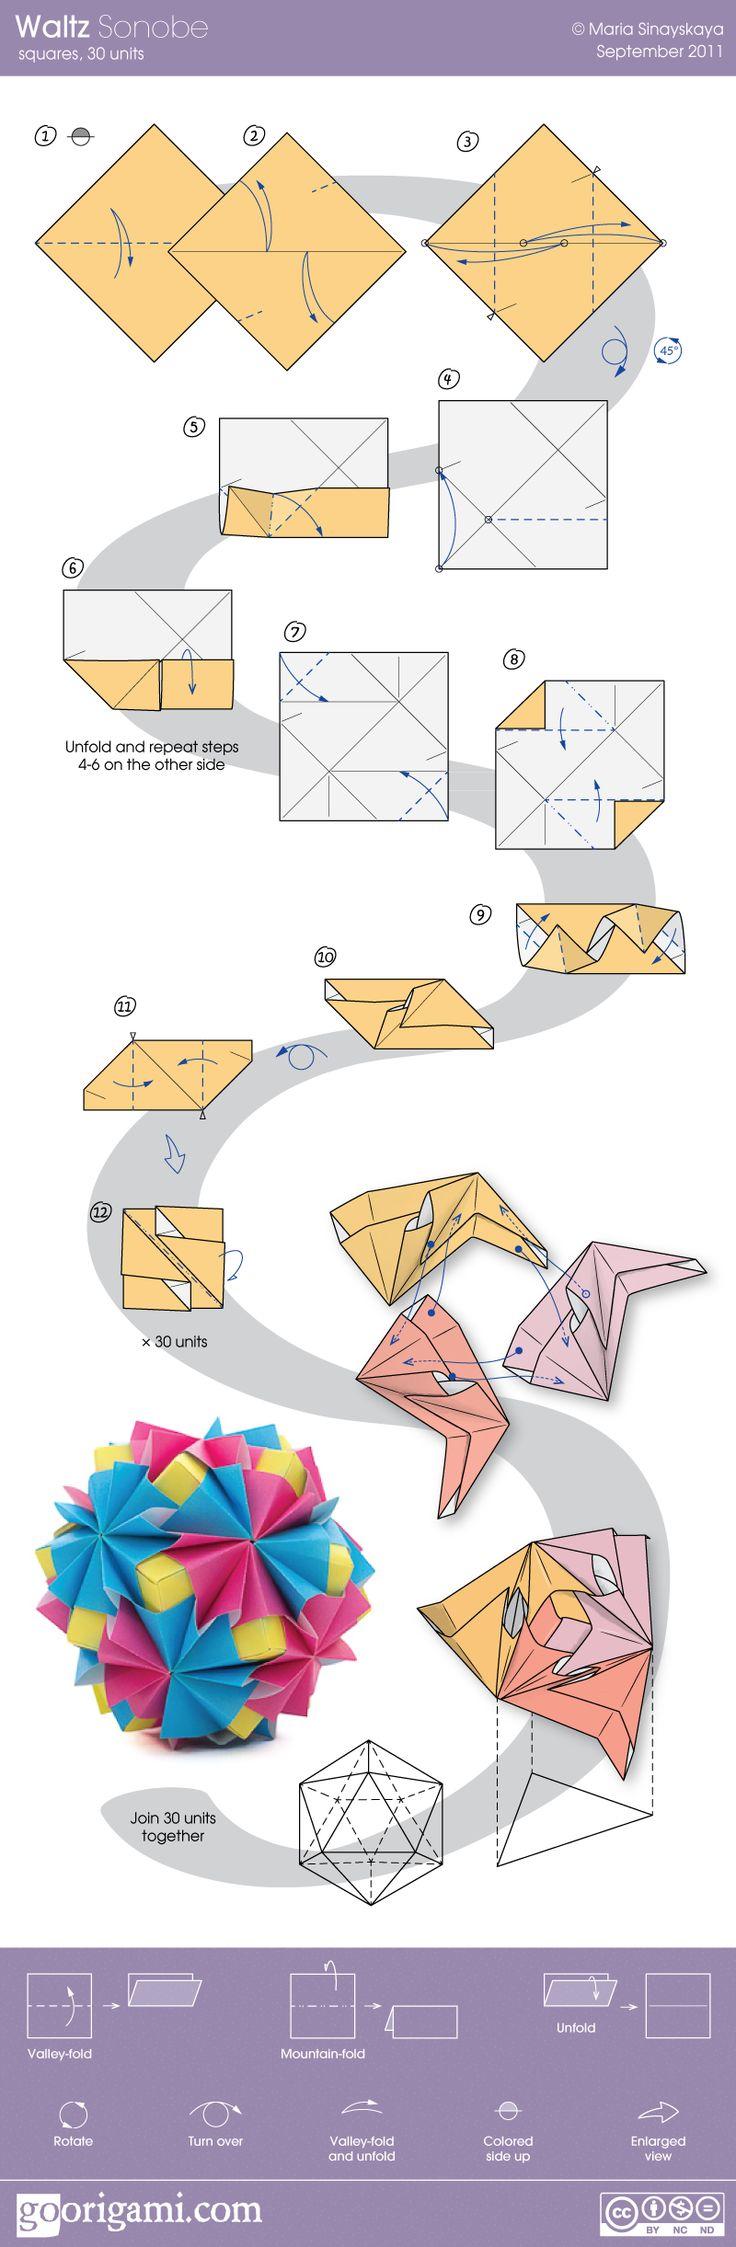 Waltz Sonobe Diagram